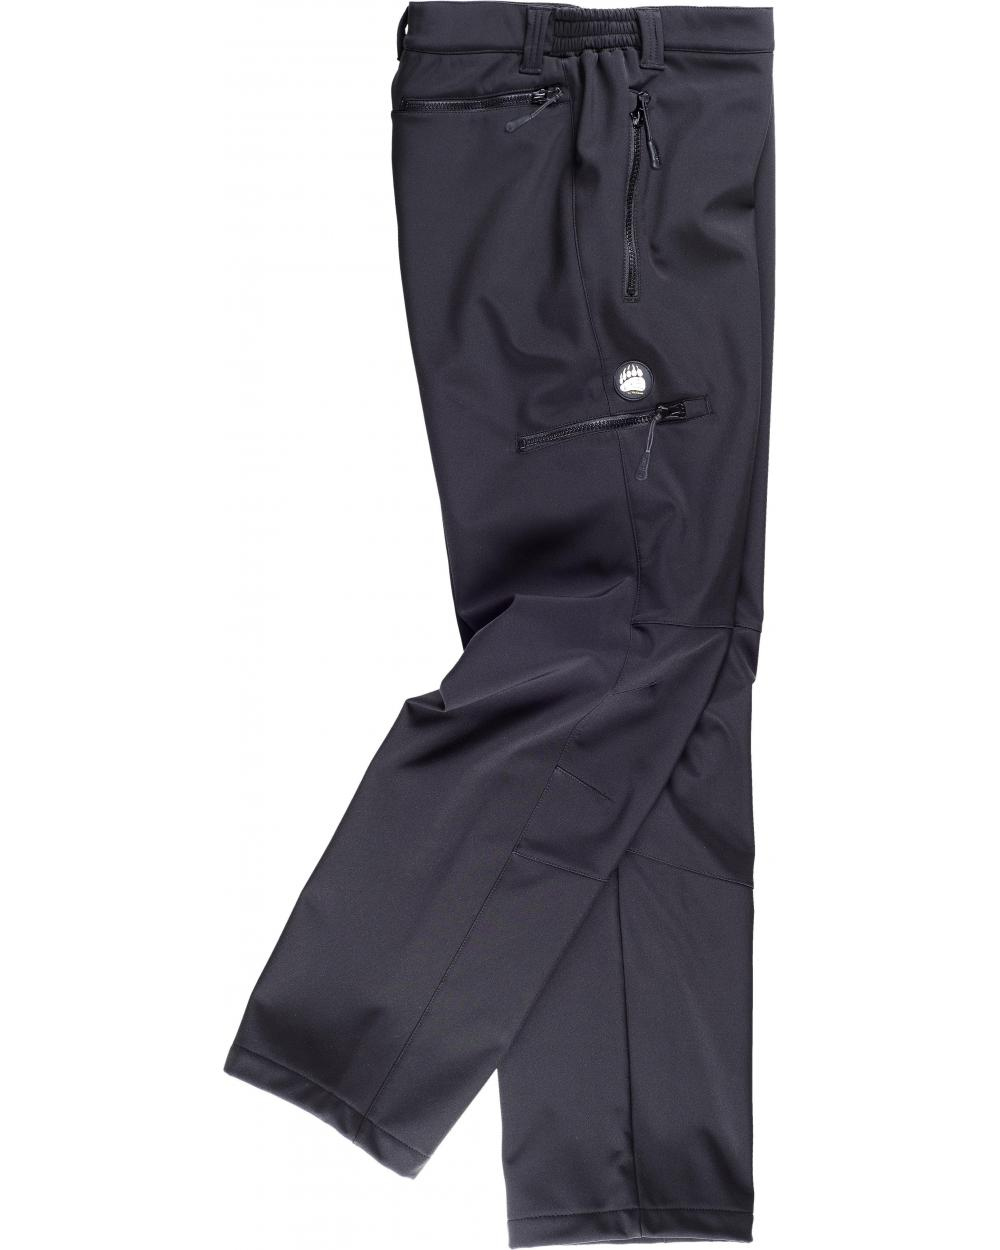 Comprar Pantalon Workshell diseño 'Slim Fit' S9830 Negro workteam barato